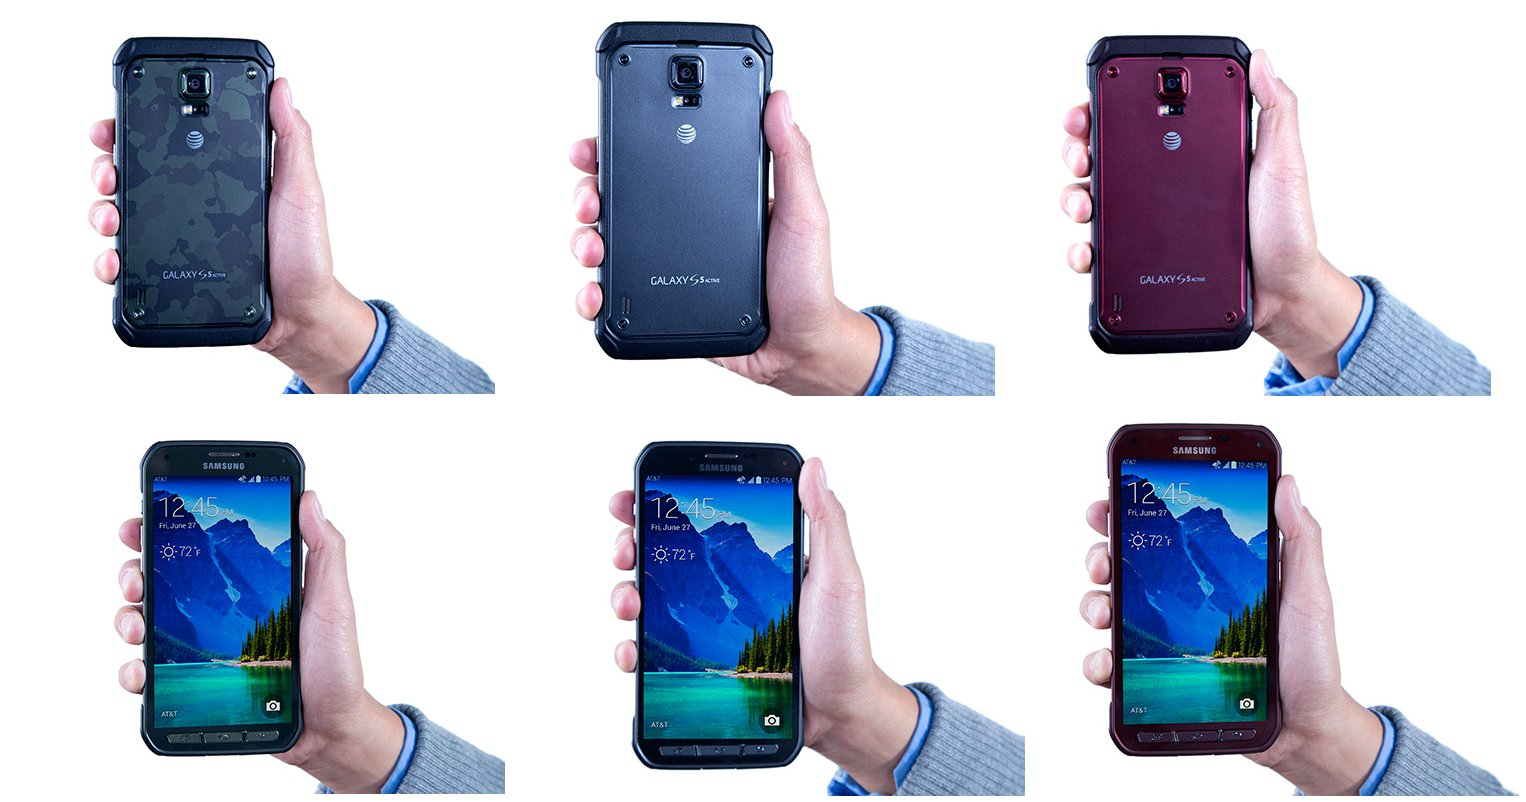 Galaxy S5 Active Titanium Gray